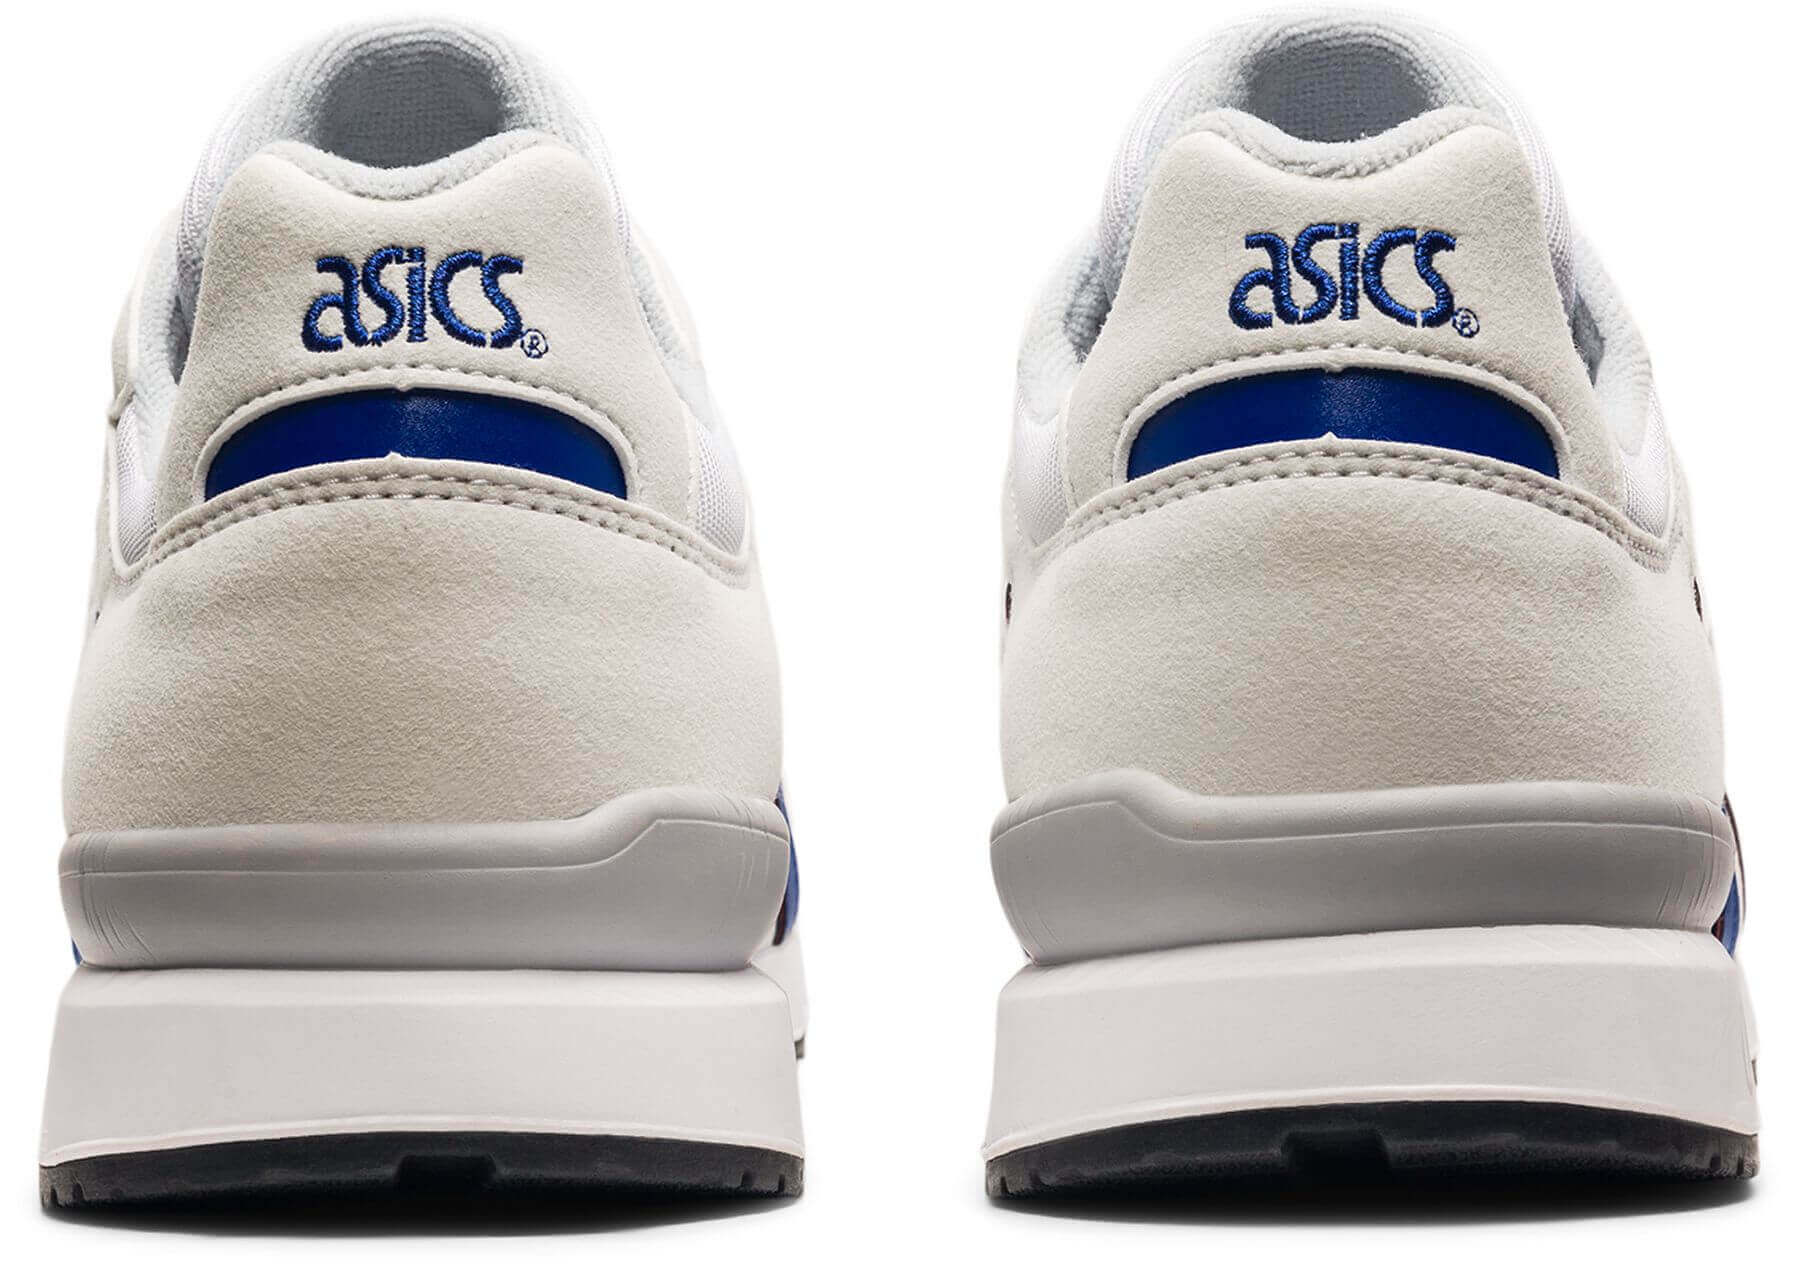 ASICSSportStyle - GT-II - white/monaco blue - 1201A253-100